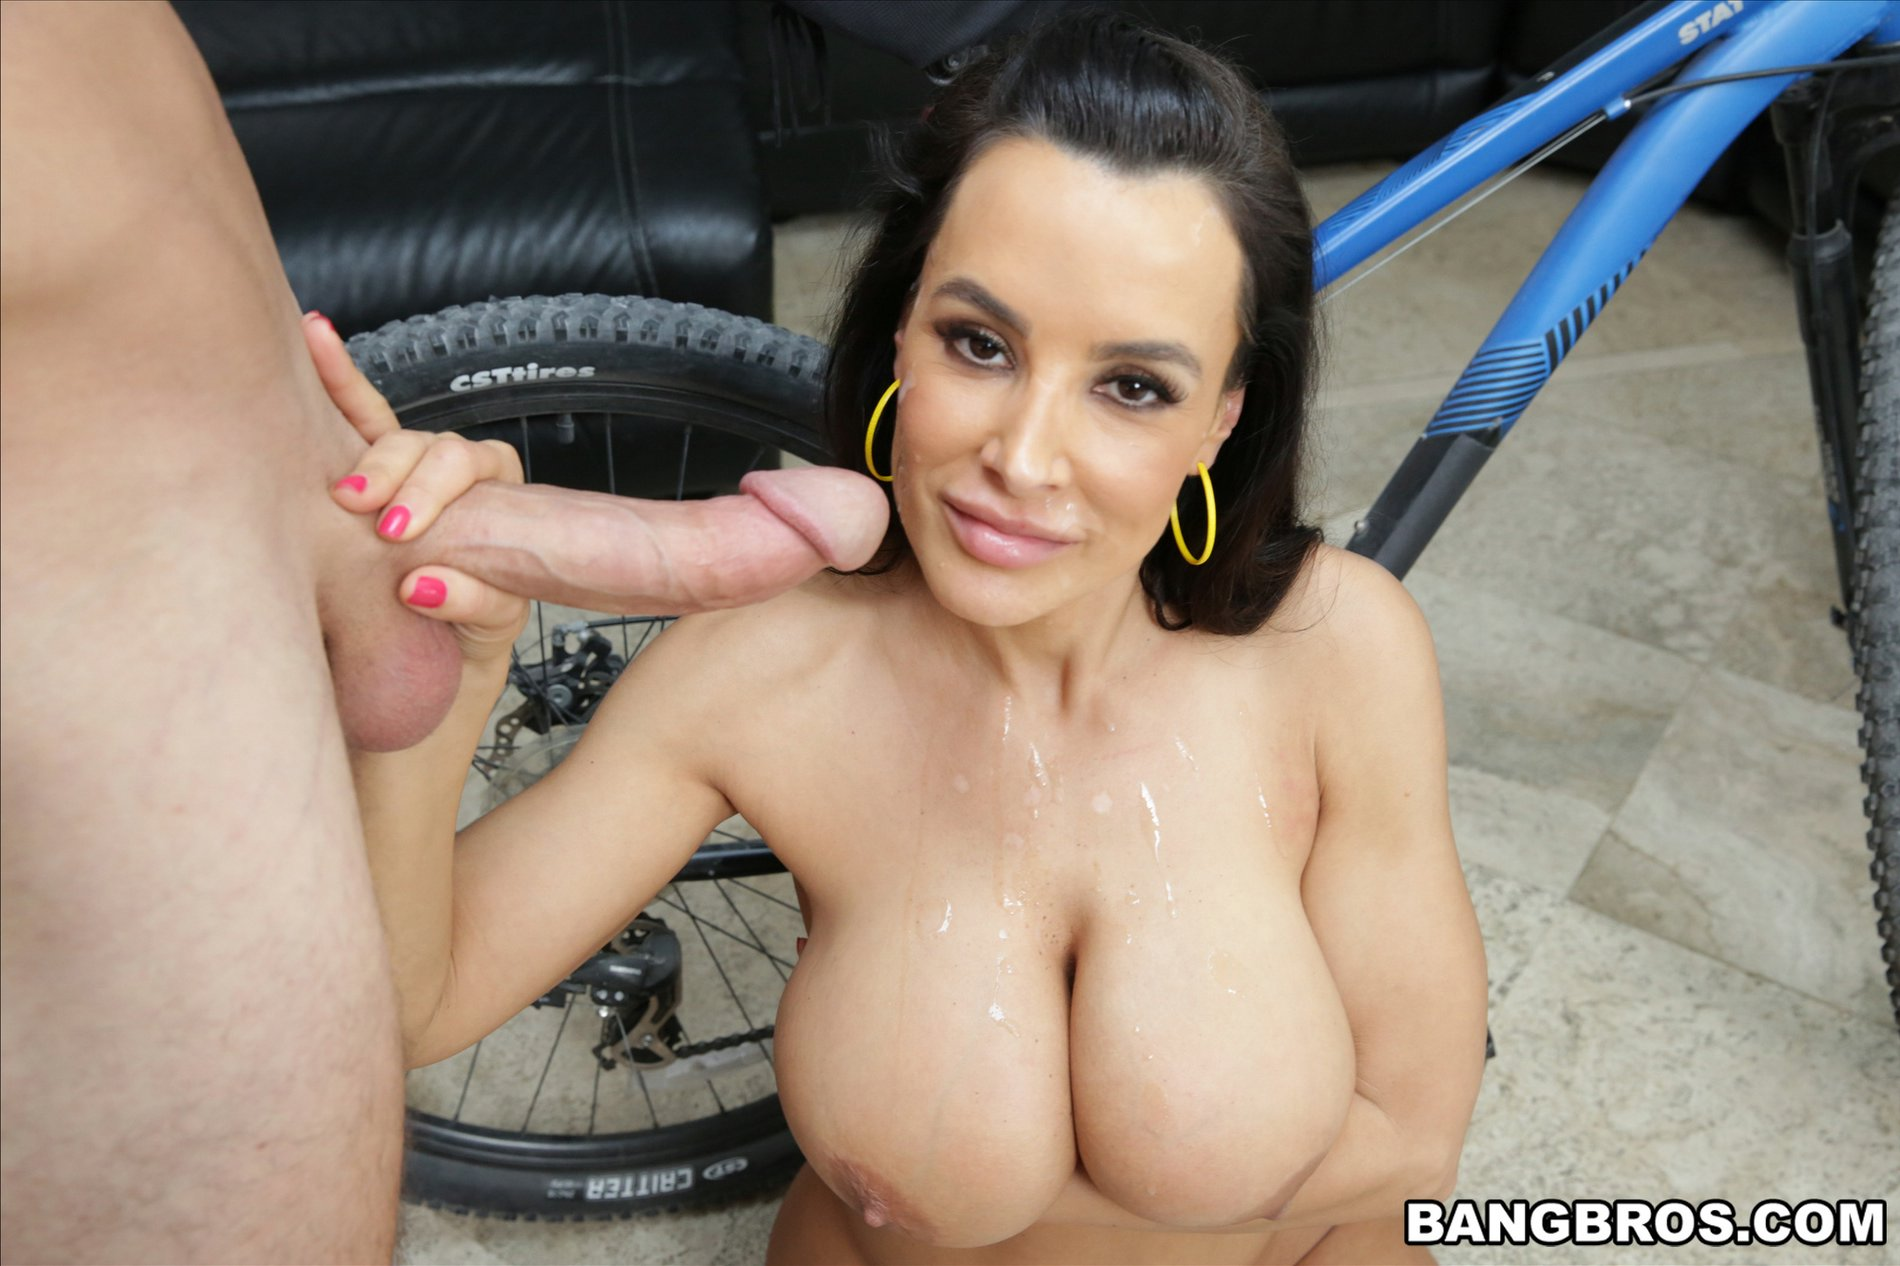 Free Porn Lisa Ann, Blowjob Pics - Pichunter